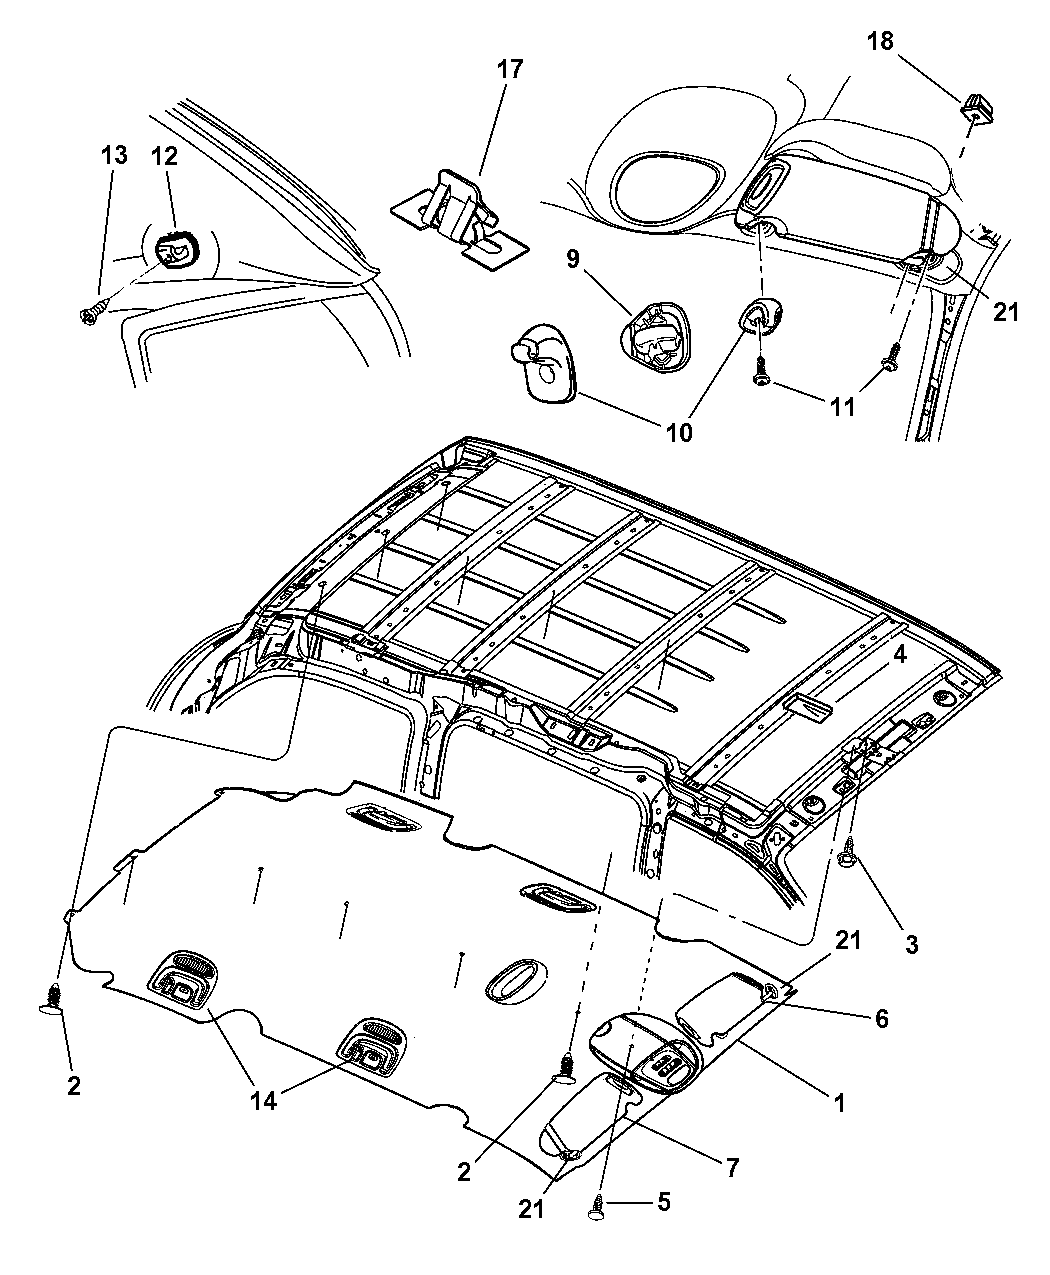 2002 Dodge Grand Caravan Headliner & Visor - Mopar Parts GiantMopar Parts Giant